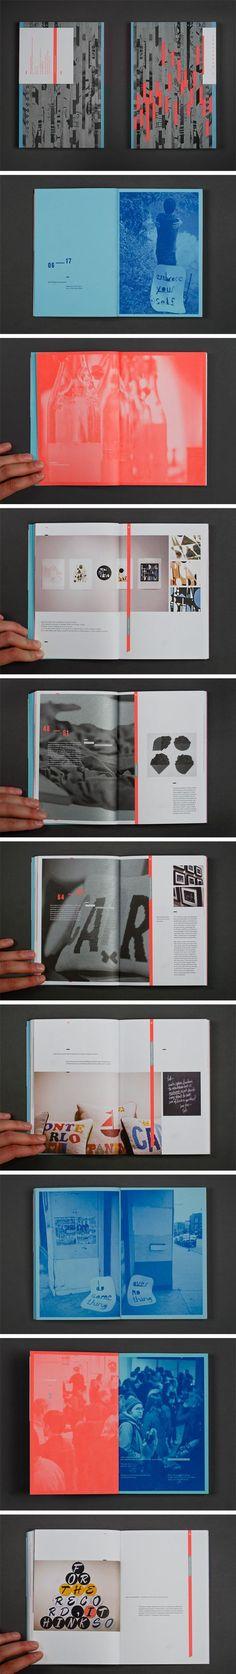 Typeforce 2 Exhibition Catalogue: